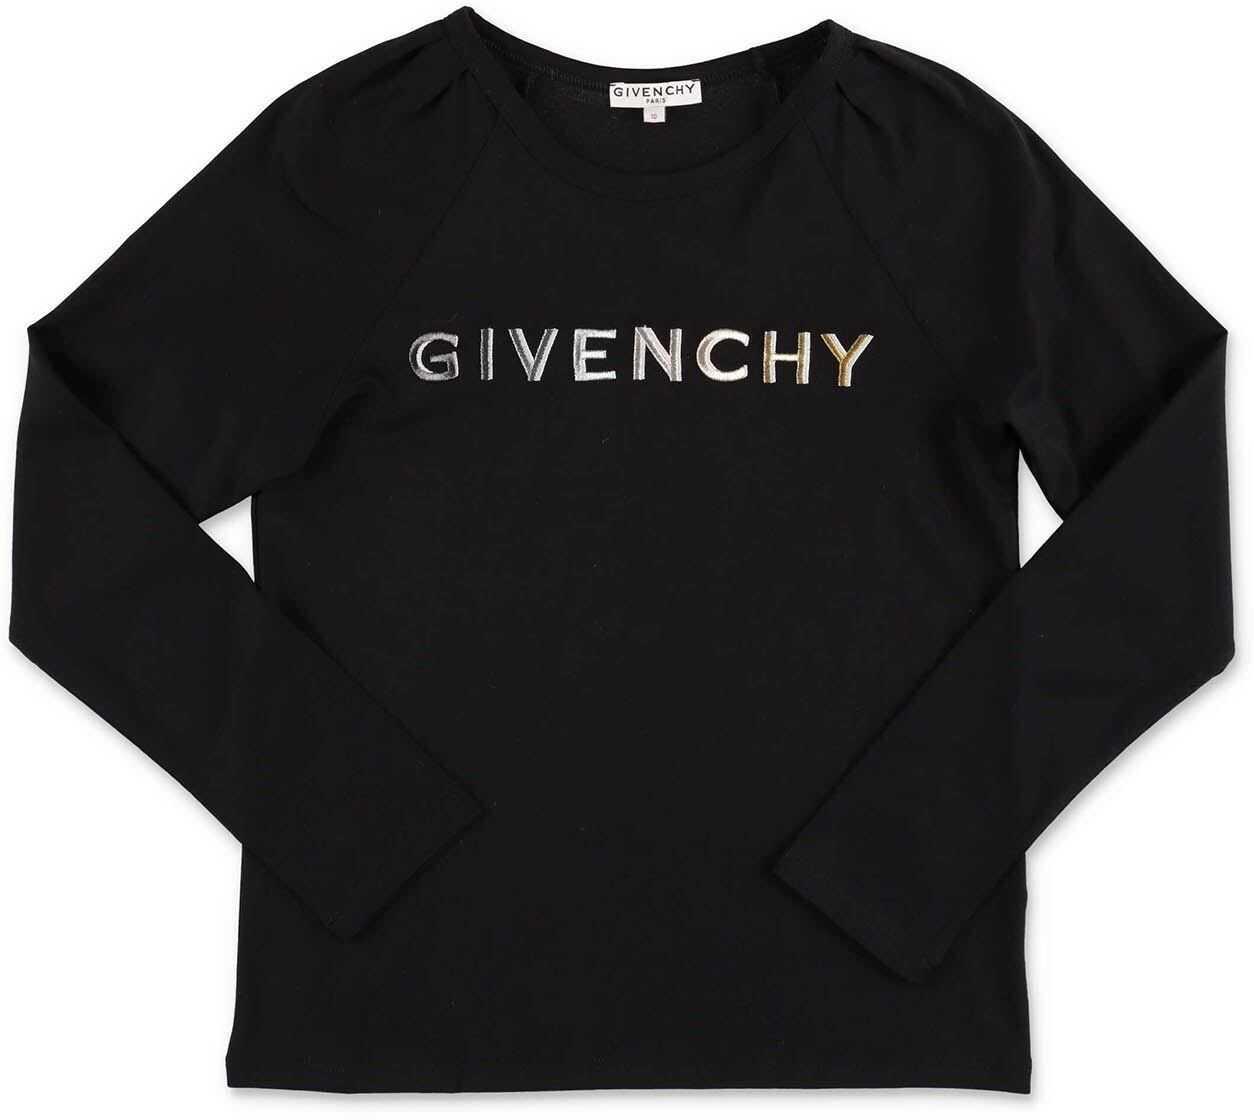 Givenchy Black Long Sleeve T-Shirt Black